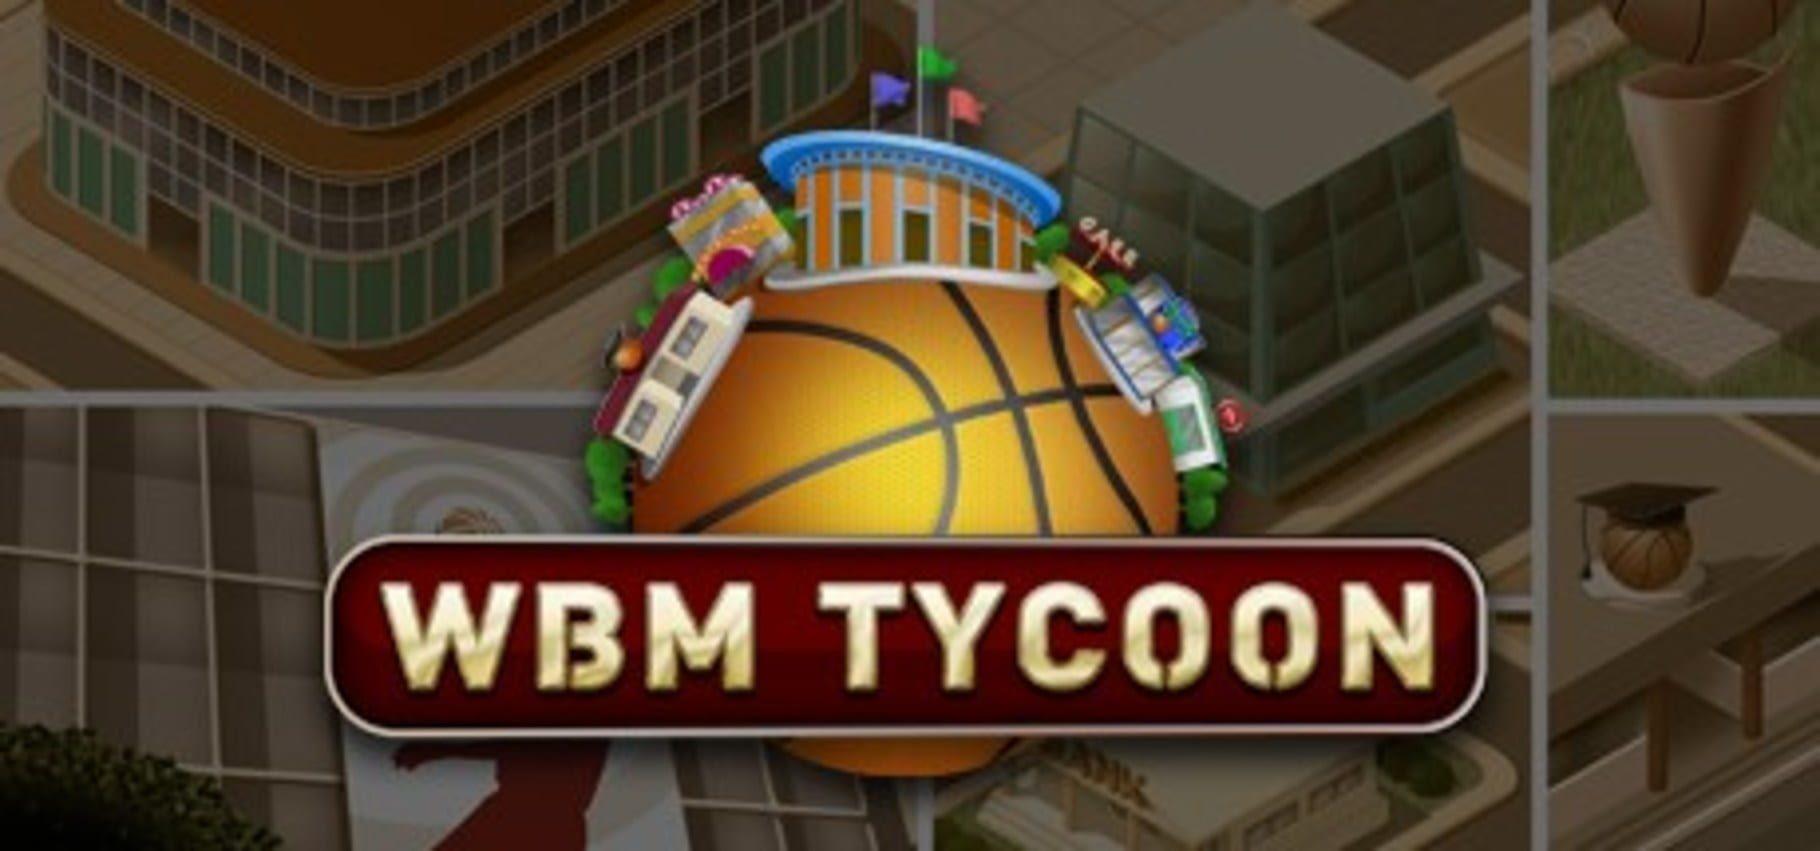 buy World Basketball Tycoon cd key for pc platform